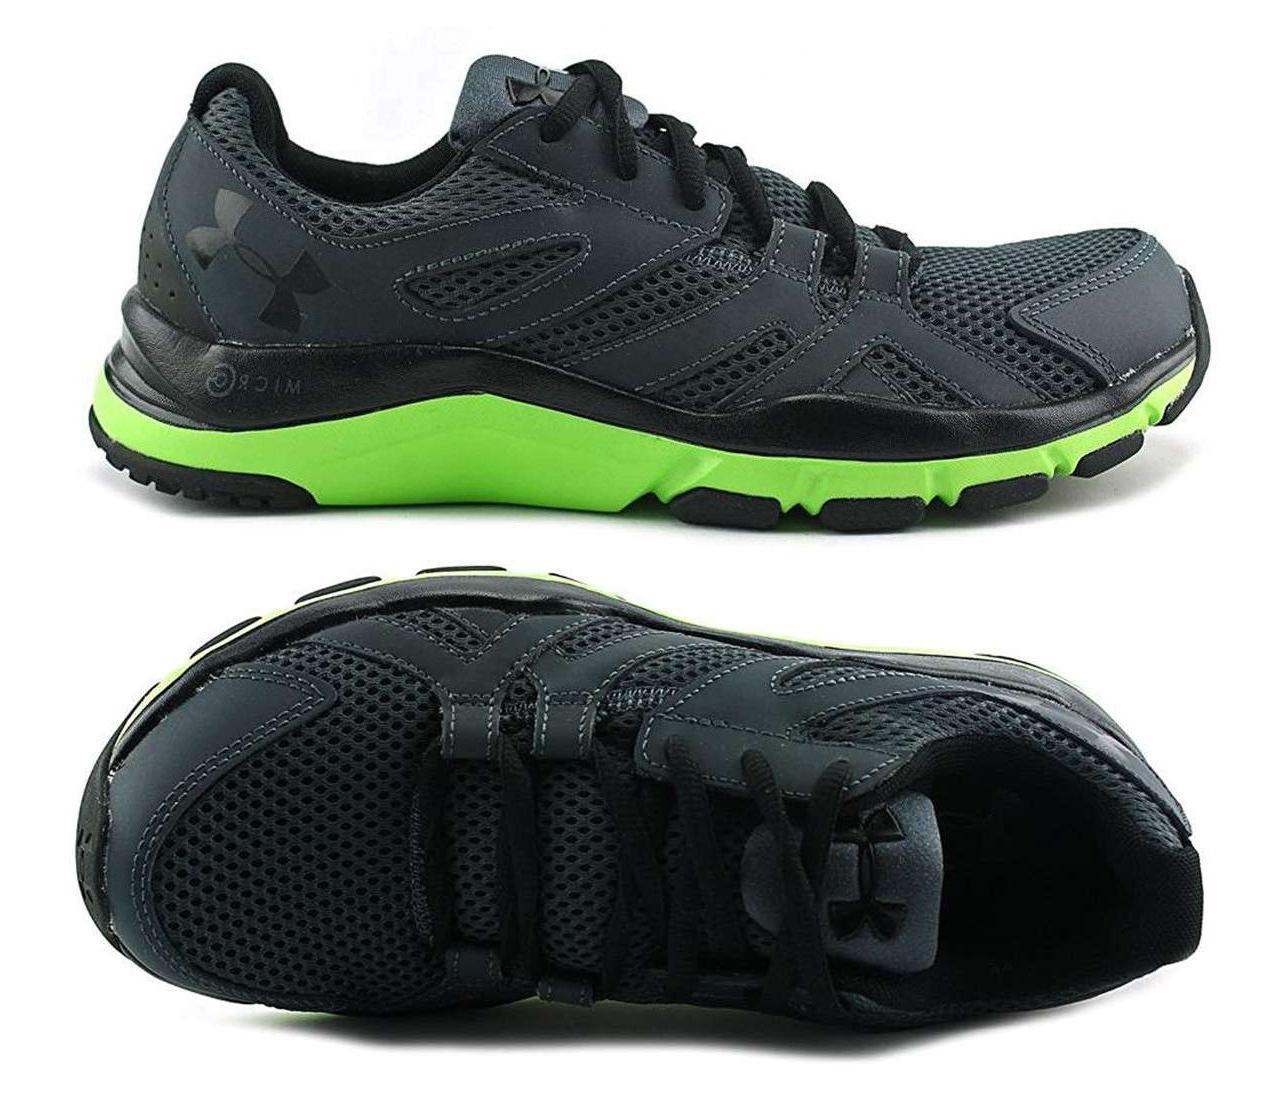 strive 6 mens running shoes mens sneakers